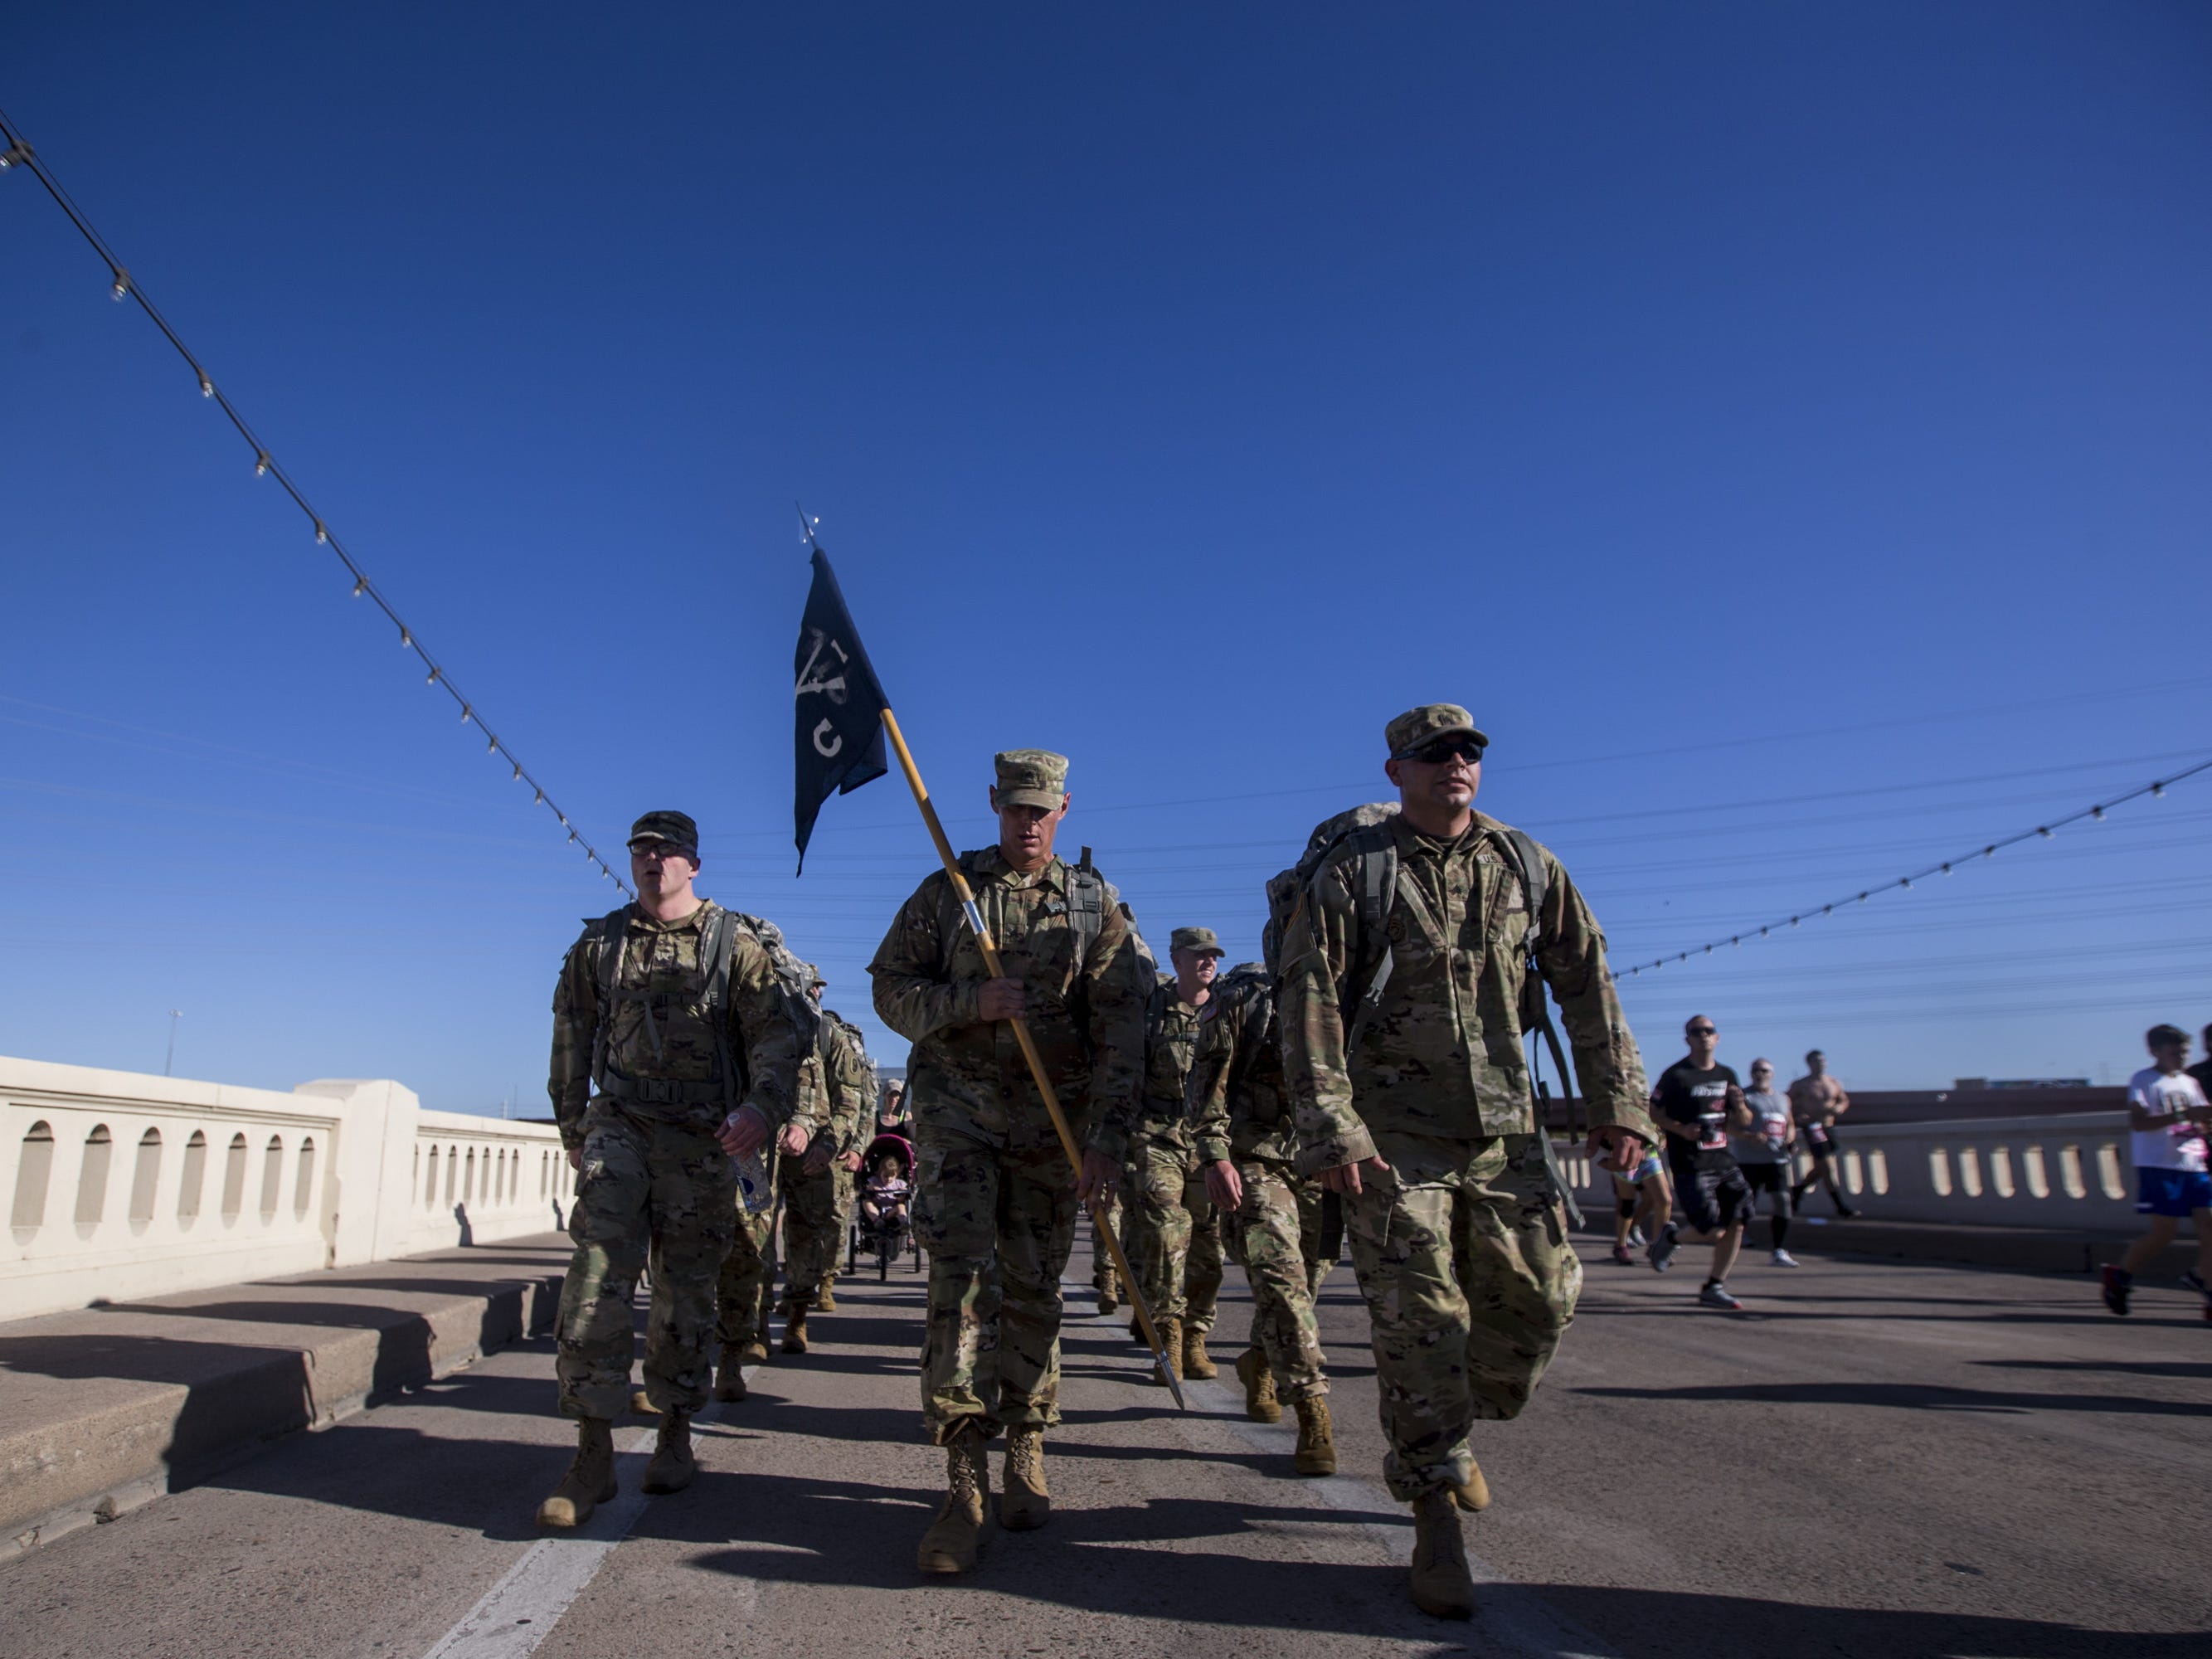 Military personnel walk across the Mill Avenue bridge during the 15th Annual Pat's Run on Saturday, April 27, 2019, in Tempe, Ariz.